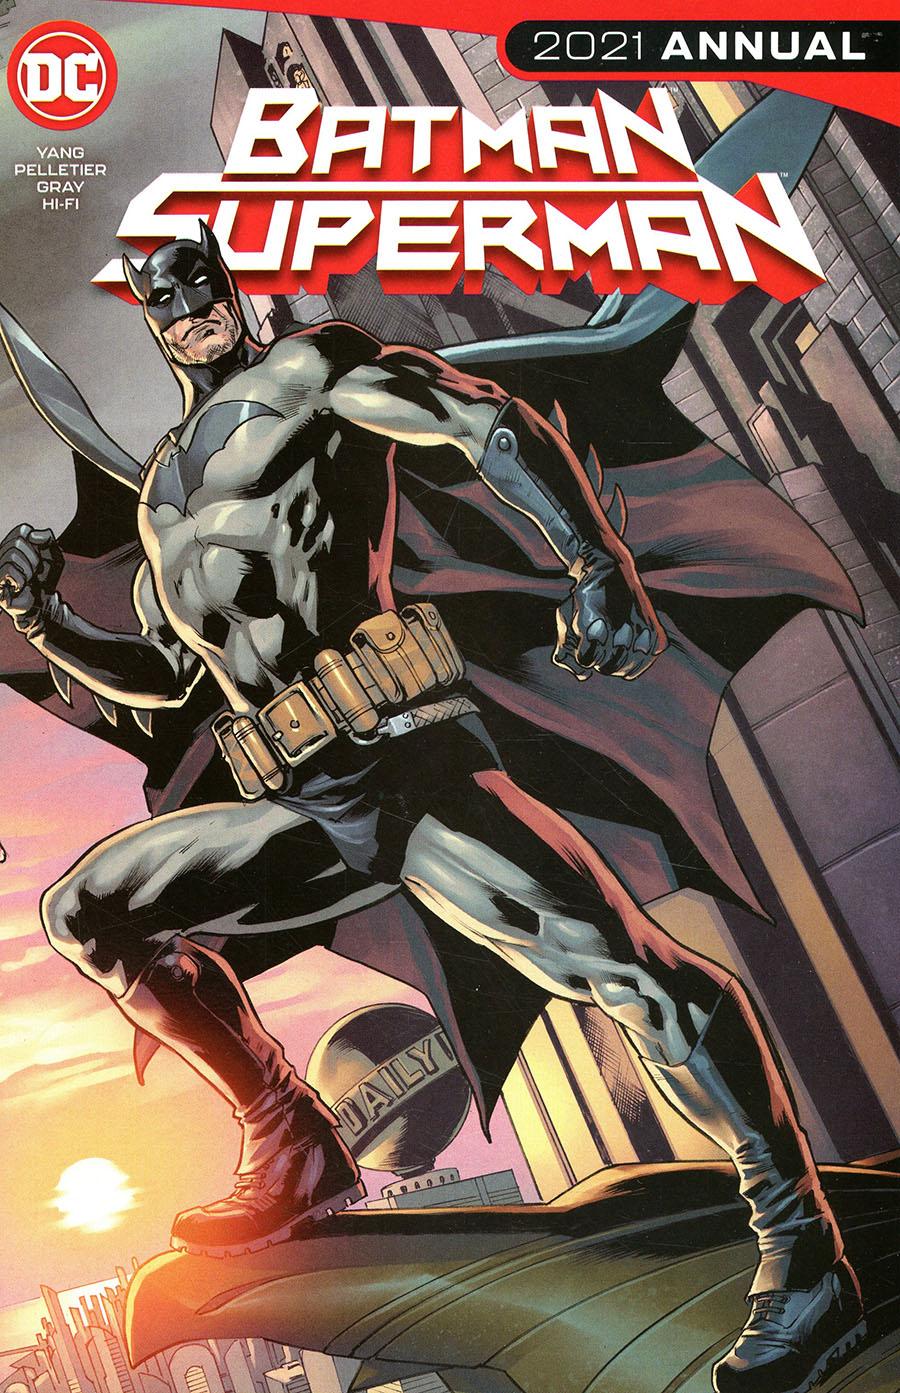 Batman Superman Vol 2 2021 Annual #1 Cover A Regular Bryan Hitch Connected Flip Cover